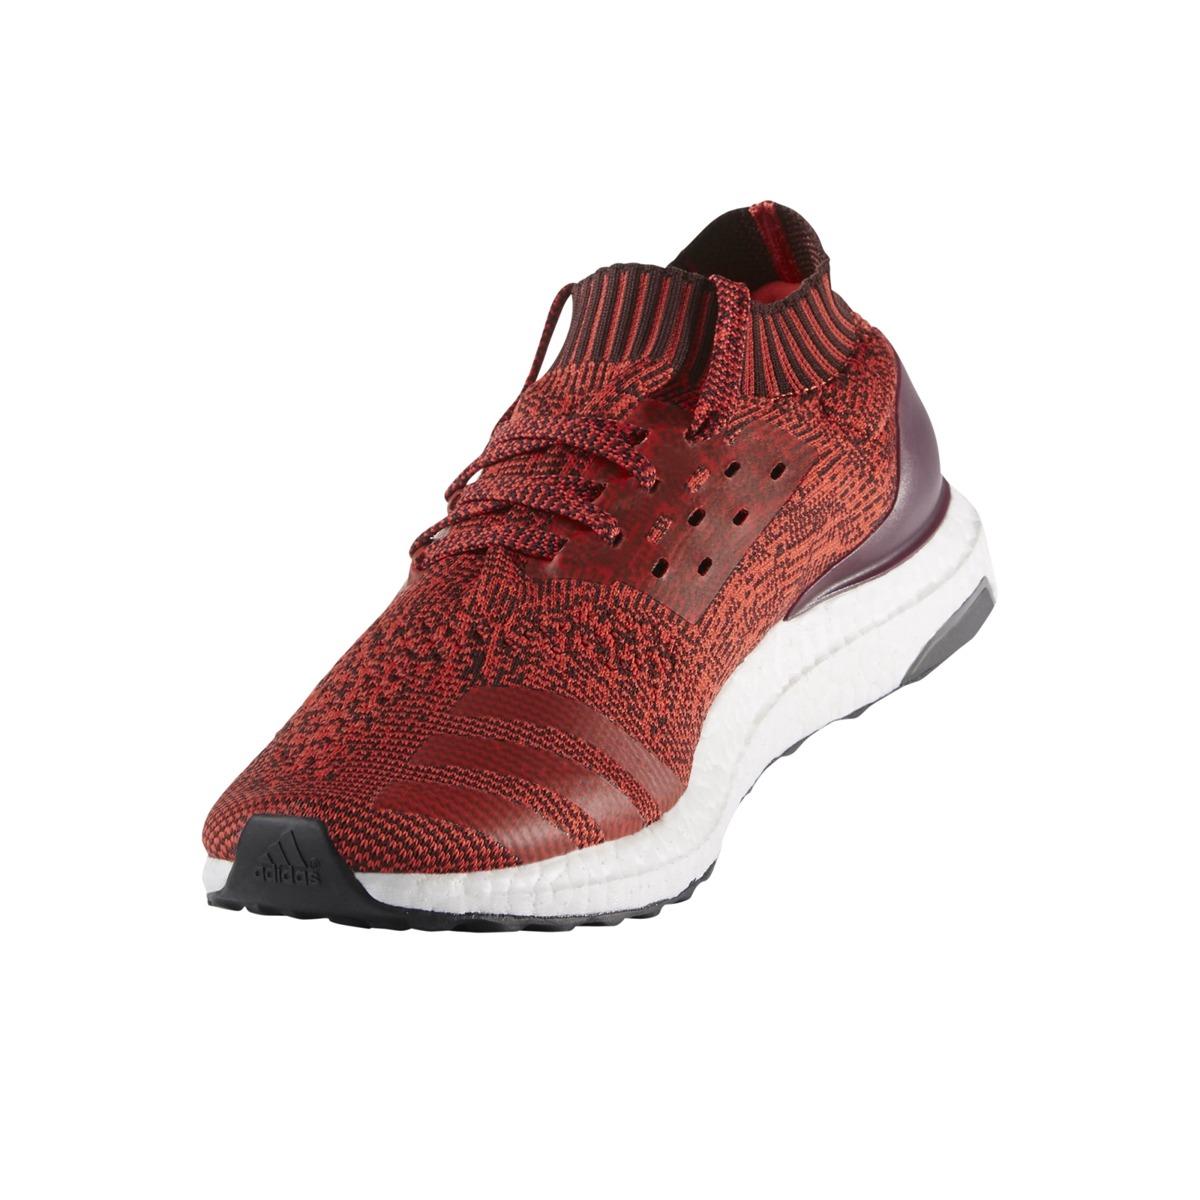 zapatillas adidas running ultraboost uncaged hombre rj bd. Cargando zoom. c2106c9e284cc